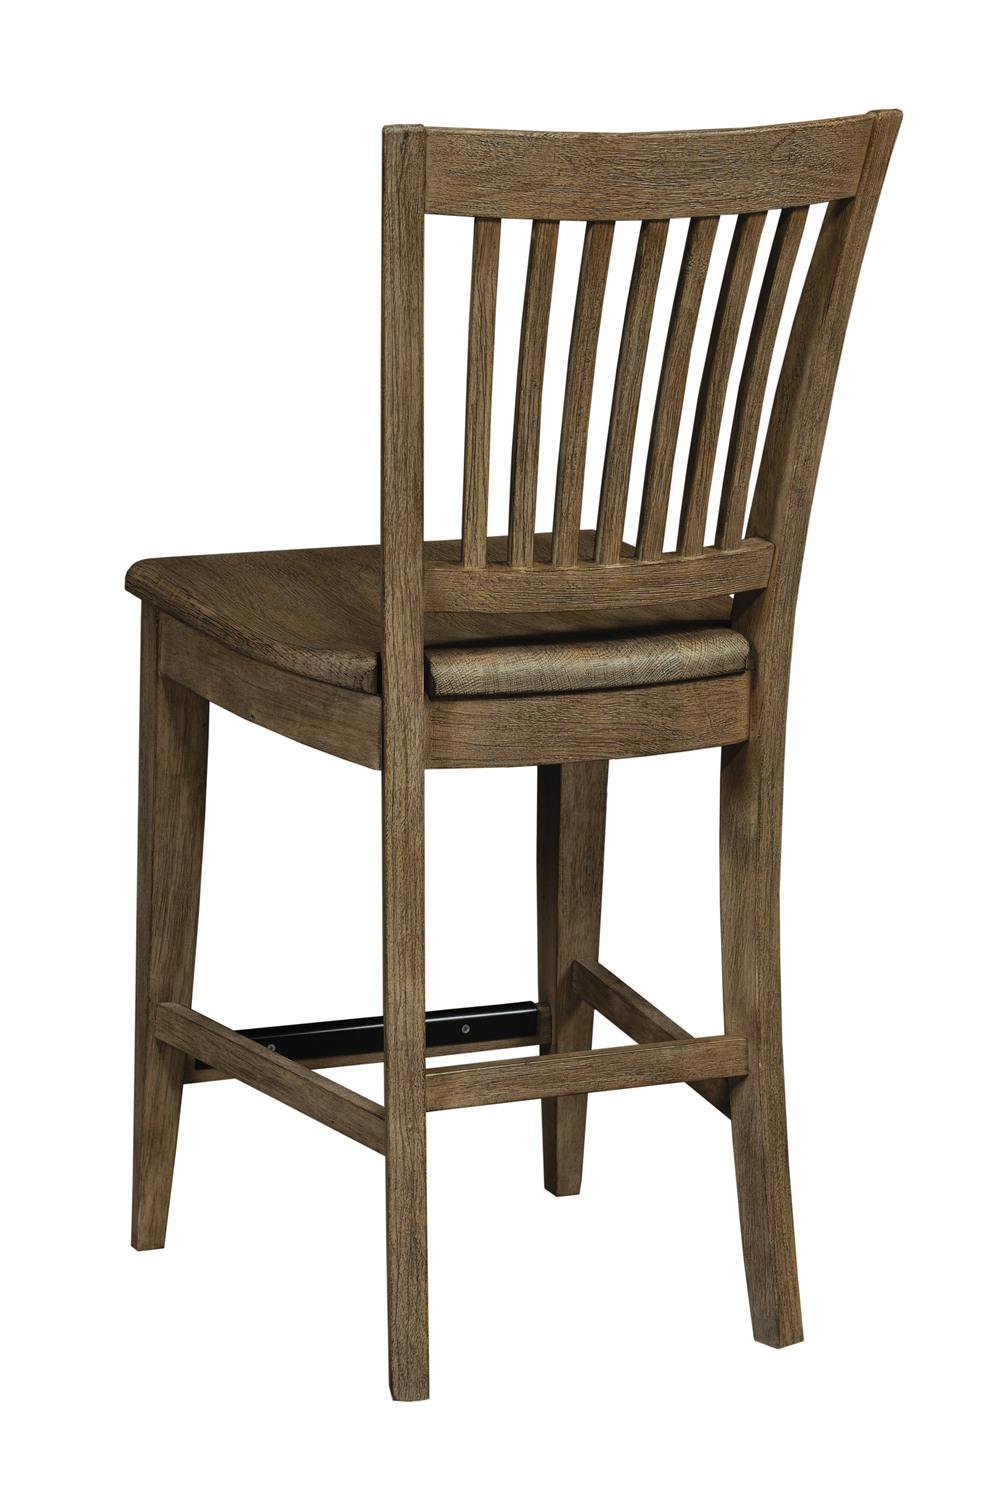 Kincaid Furniture - Counter Height Slat Back Chair